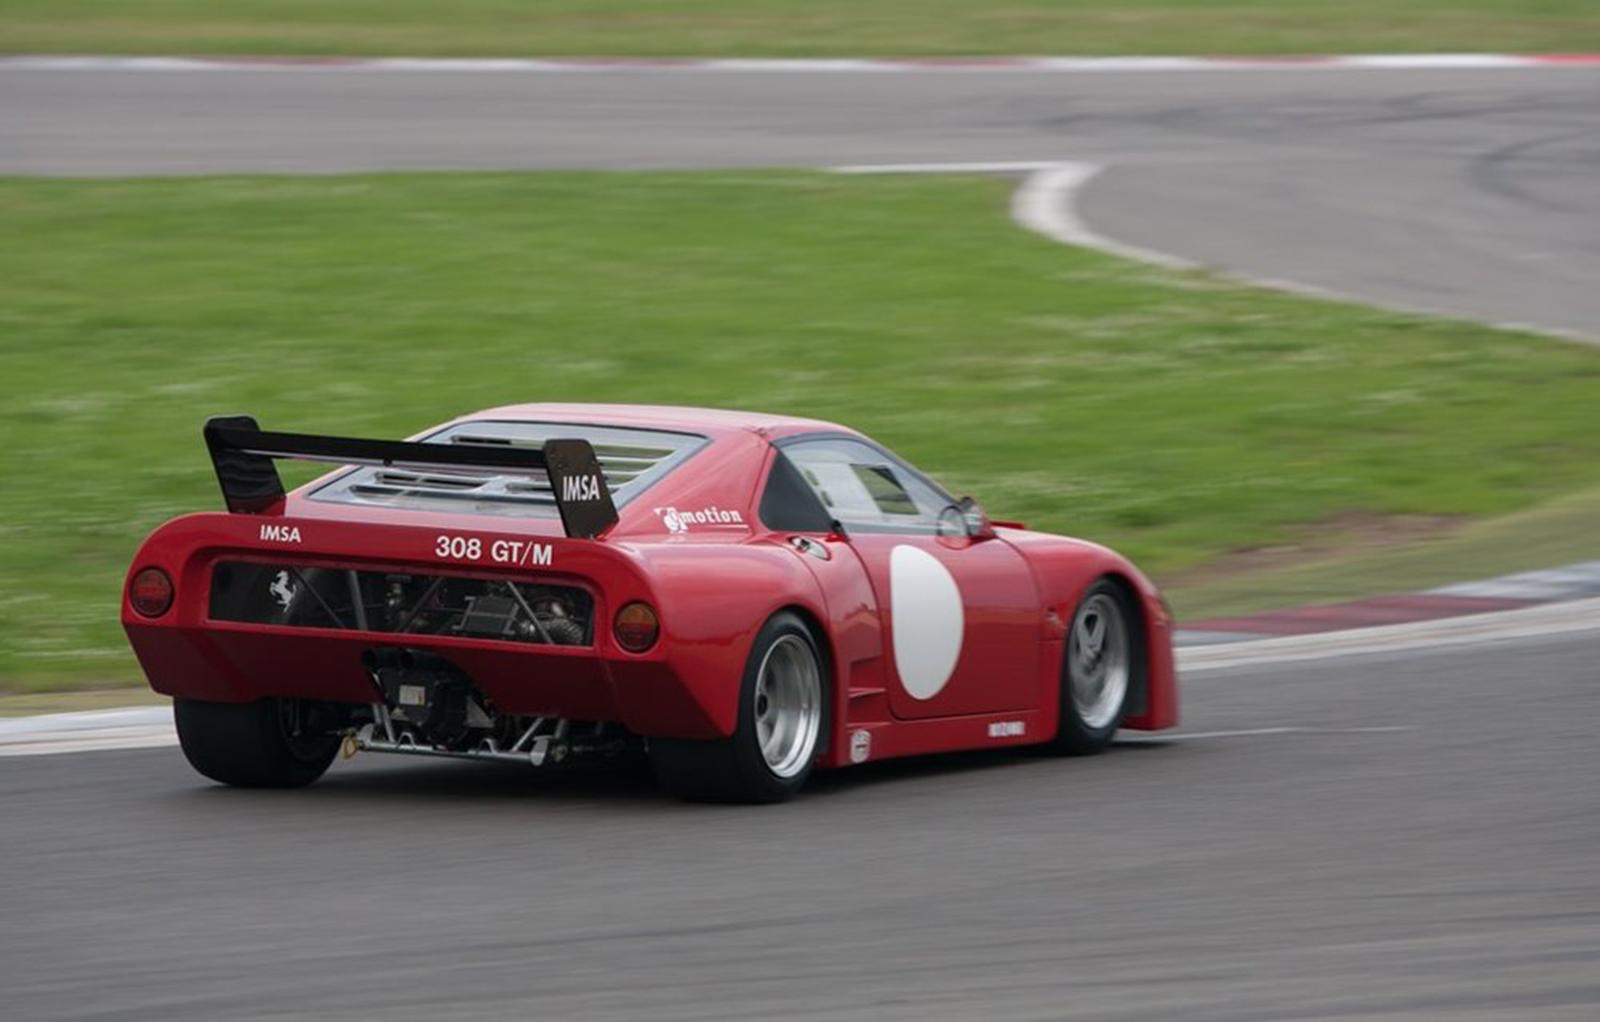 Ferrari_308_GTM_IMSA_3.jpg